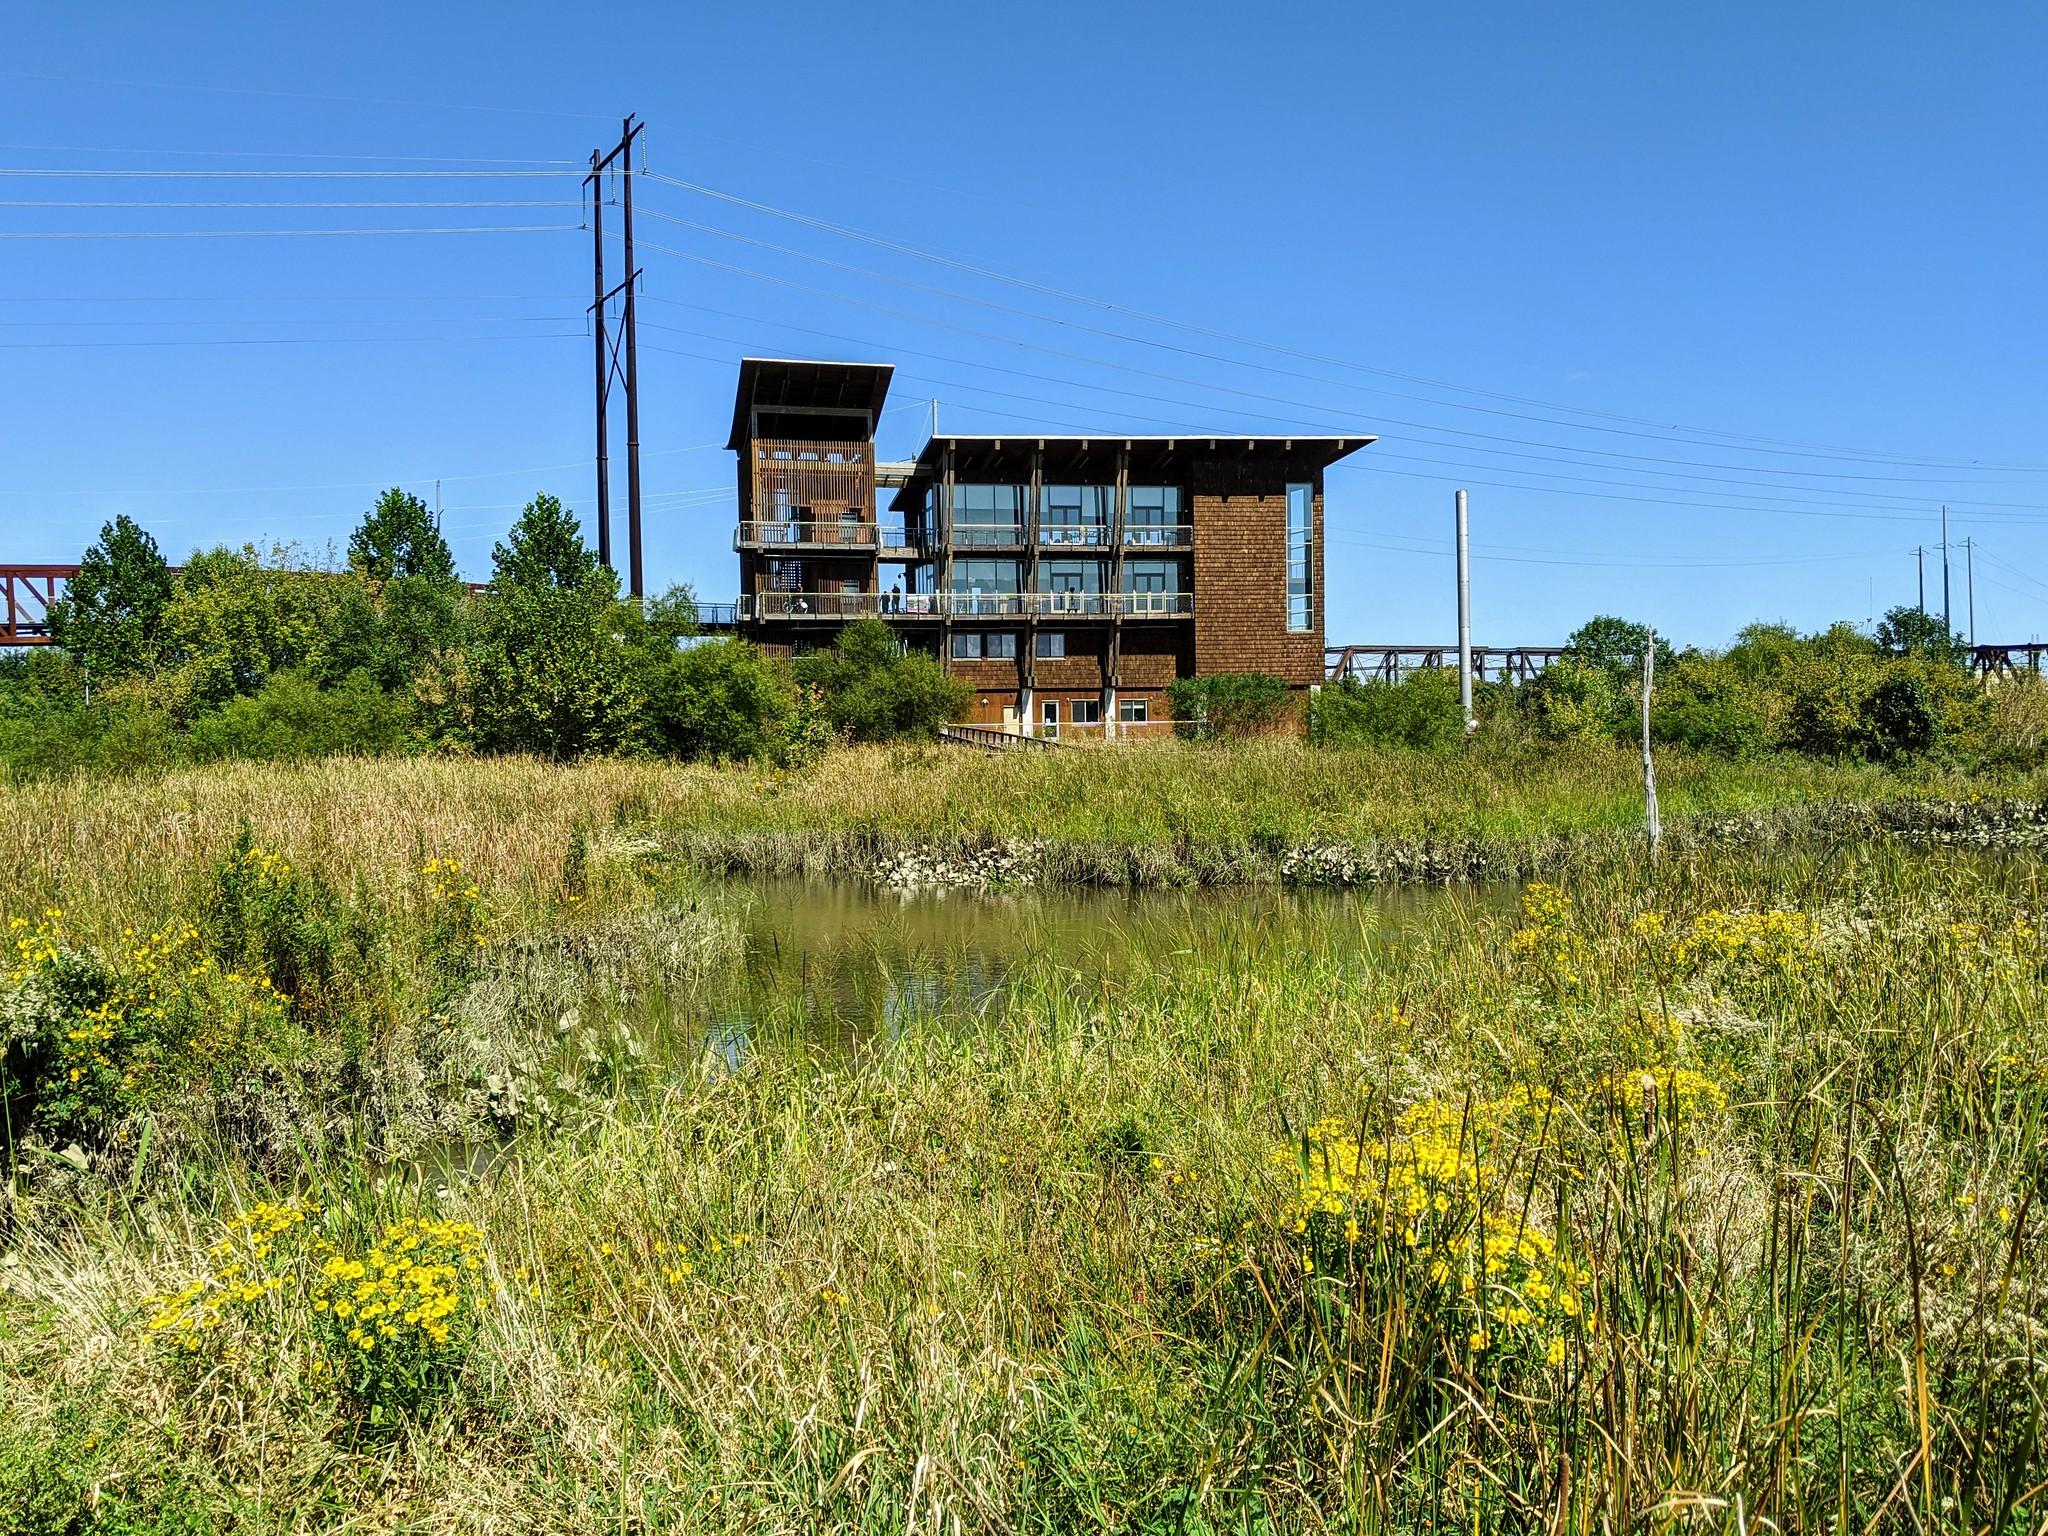 TheDuPont Environmental Education Center